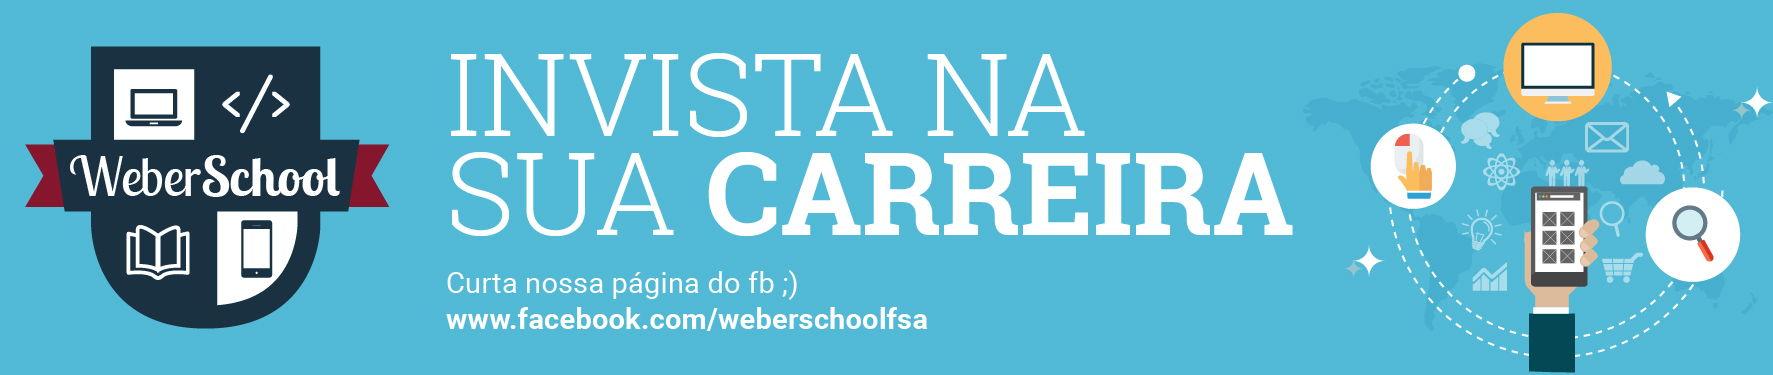 weberschool_banner_invista_carreira.jpg